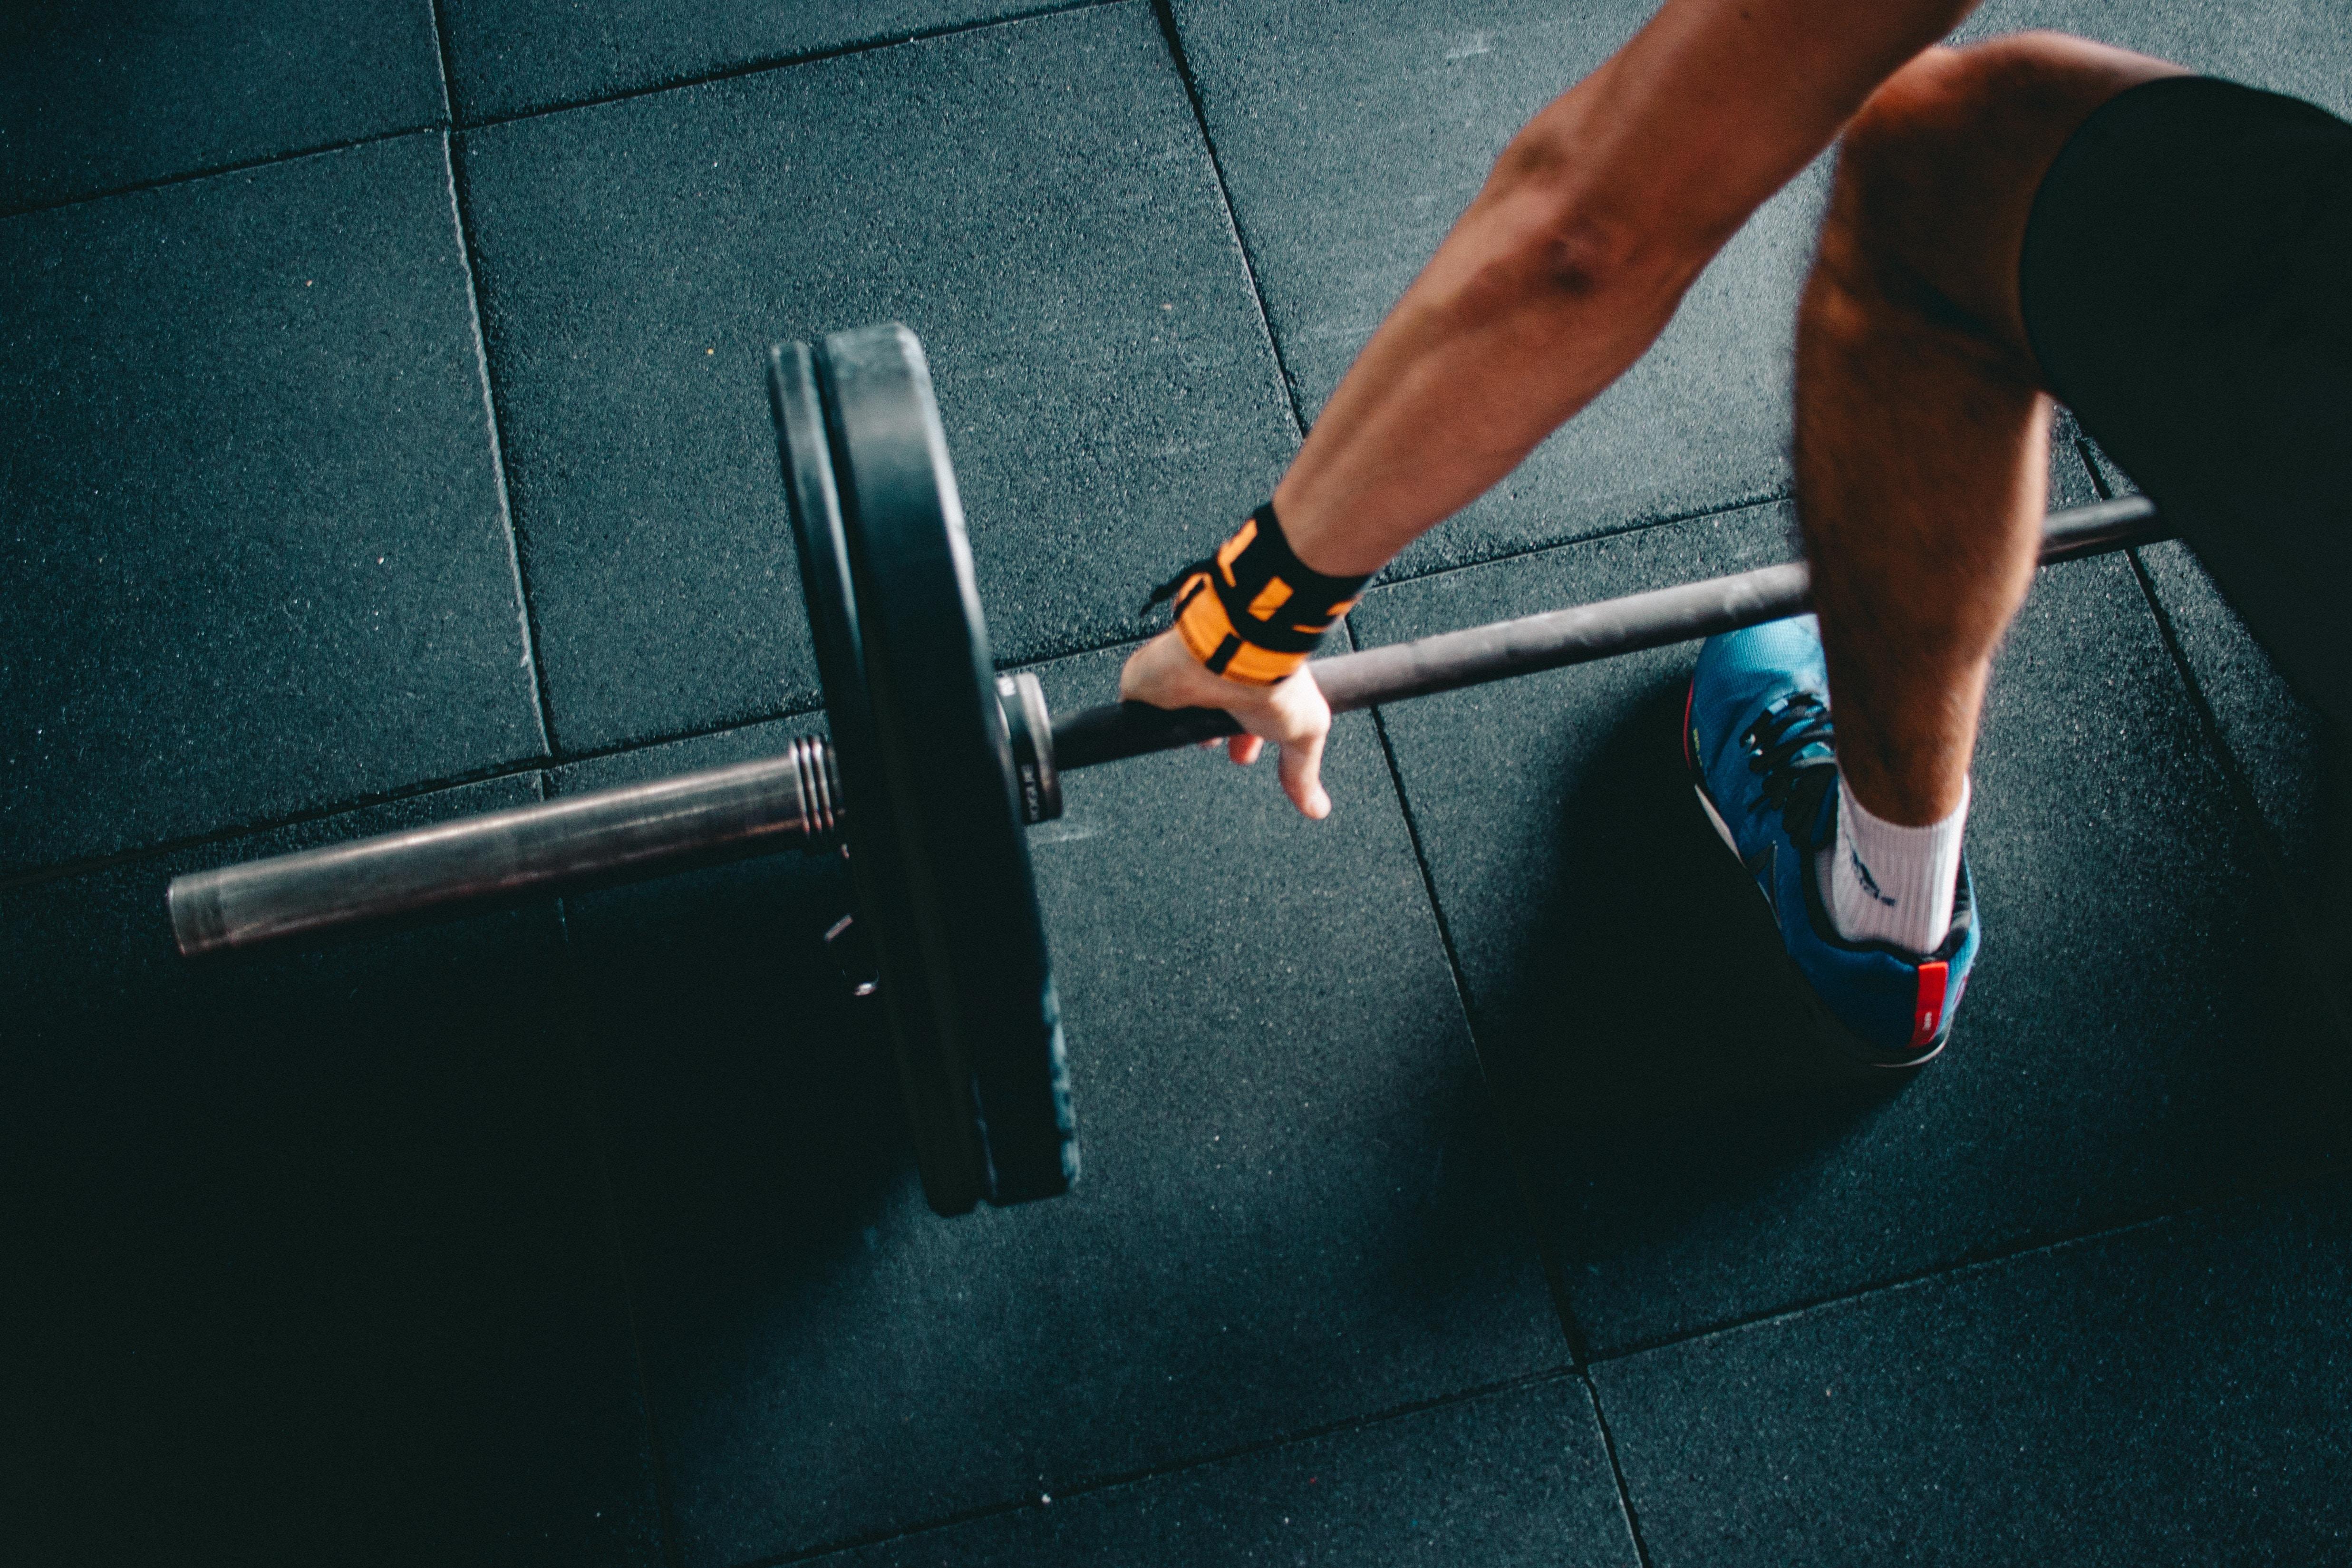 The Sports Archives Blog - The Sports Archives - 5 Benefits of Strength Training